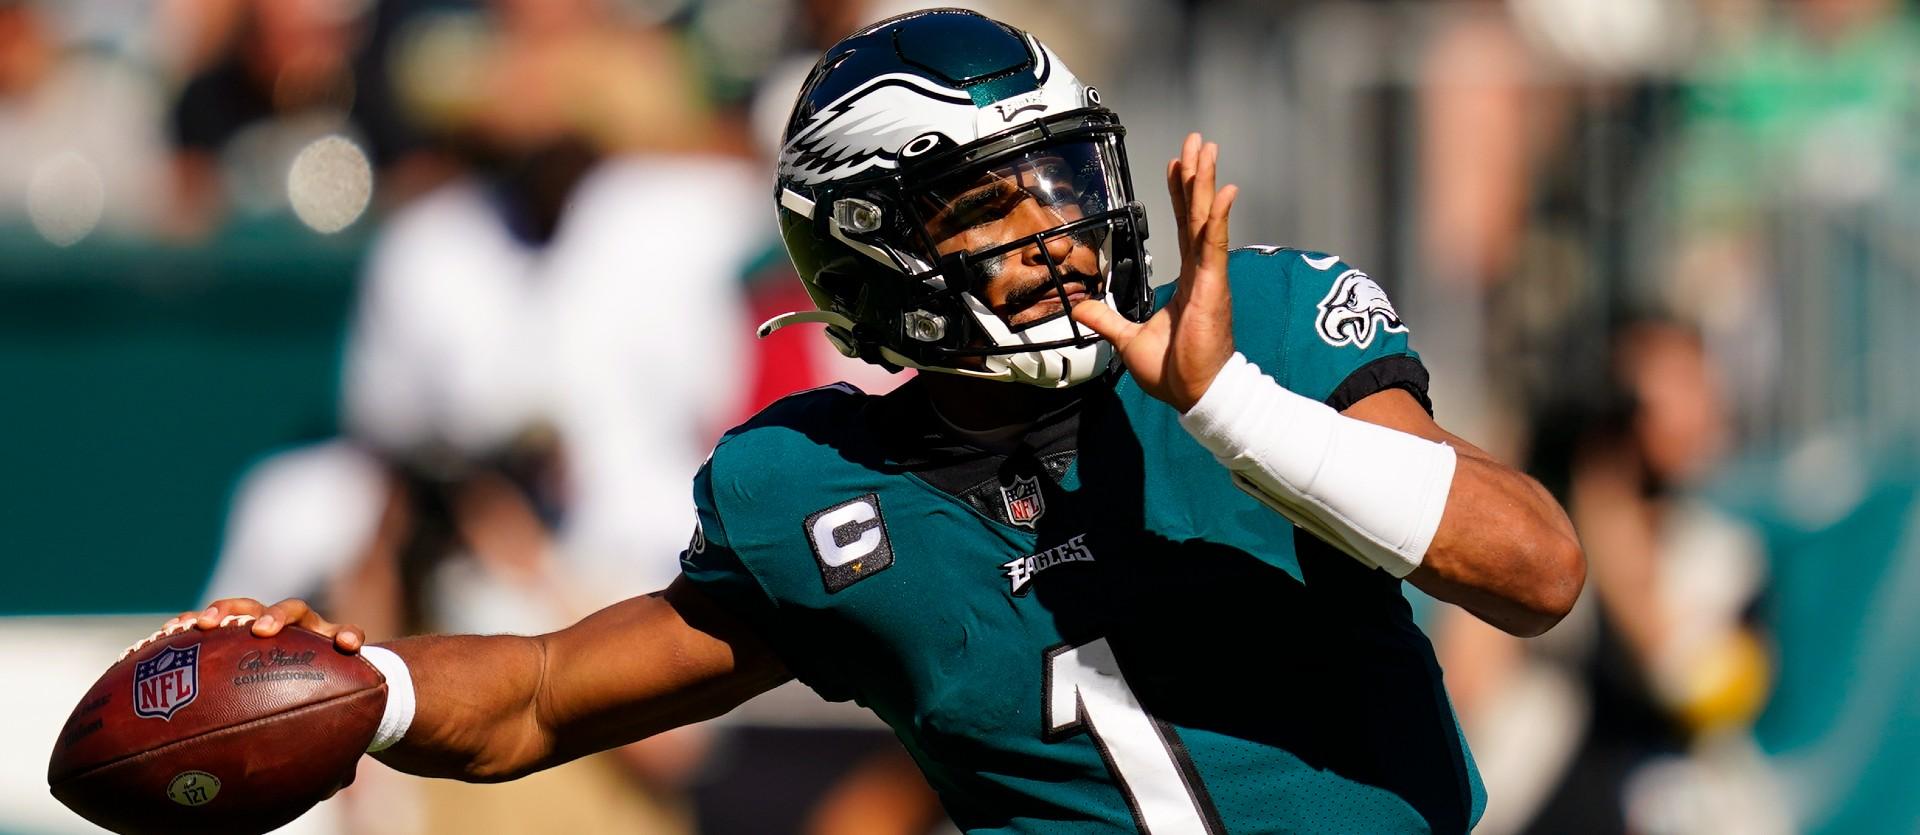 Monday Night Football Predictions: Eagles vs Cowboys Pick